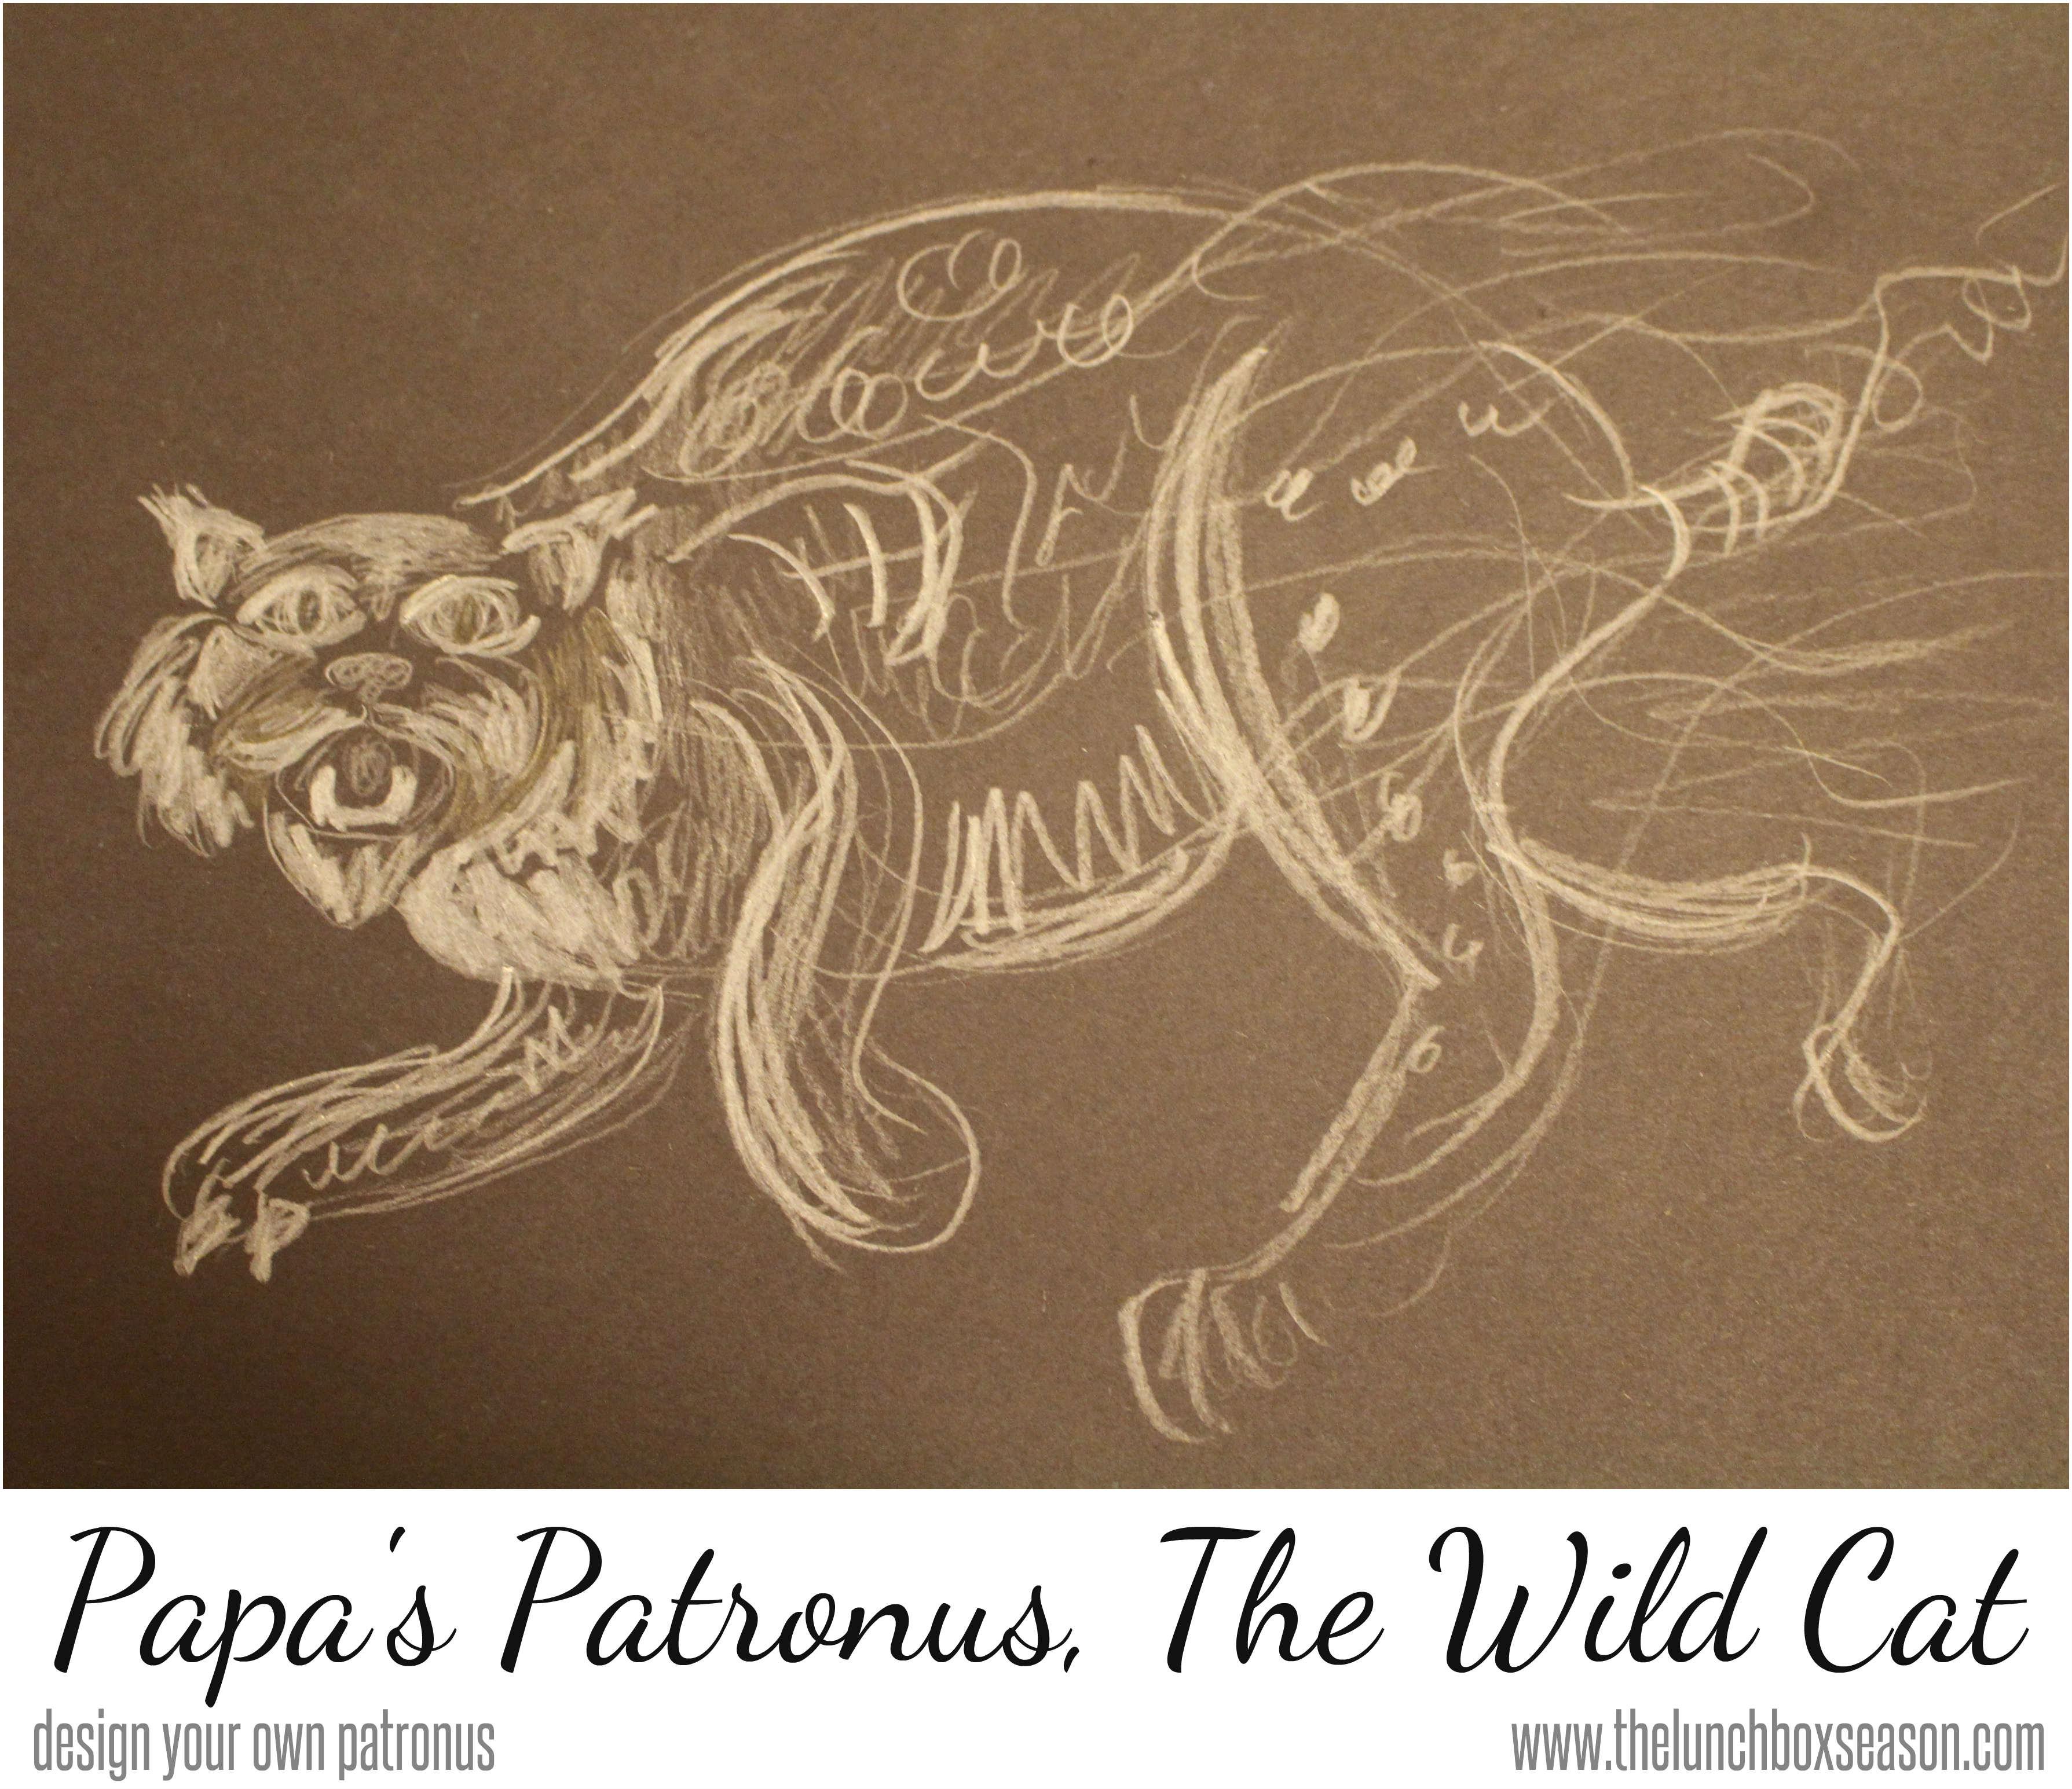 papas patronus the wild cat